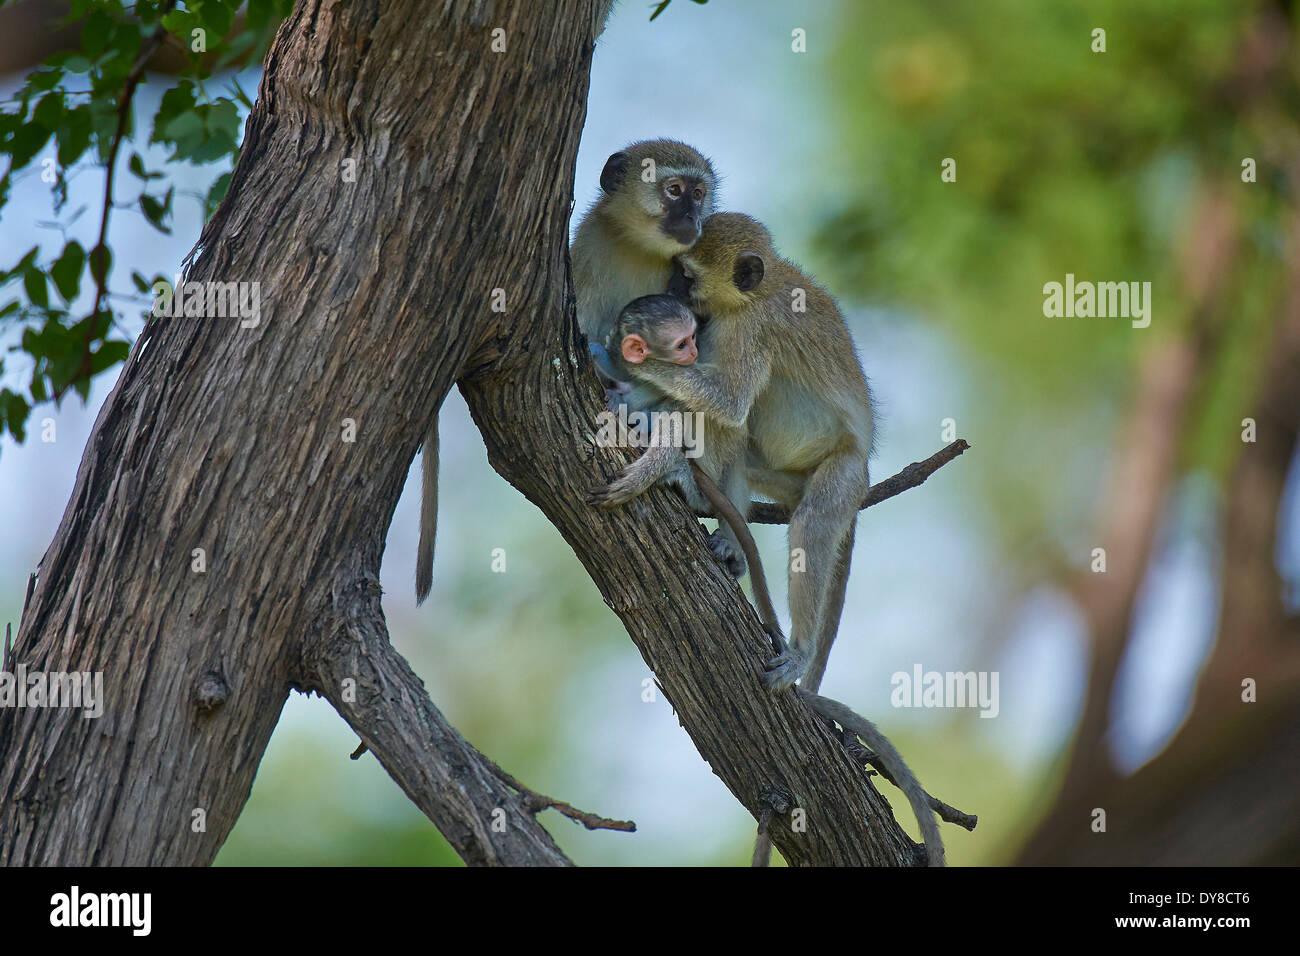 Animals Green - Best Image Atlproms.com